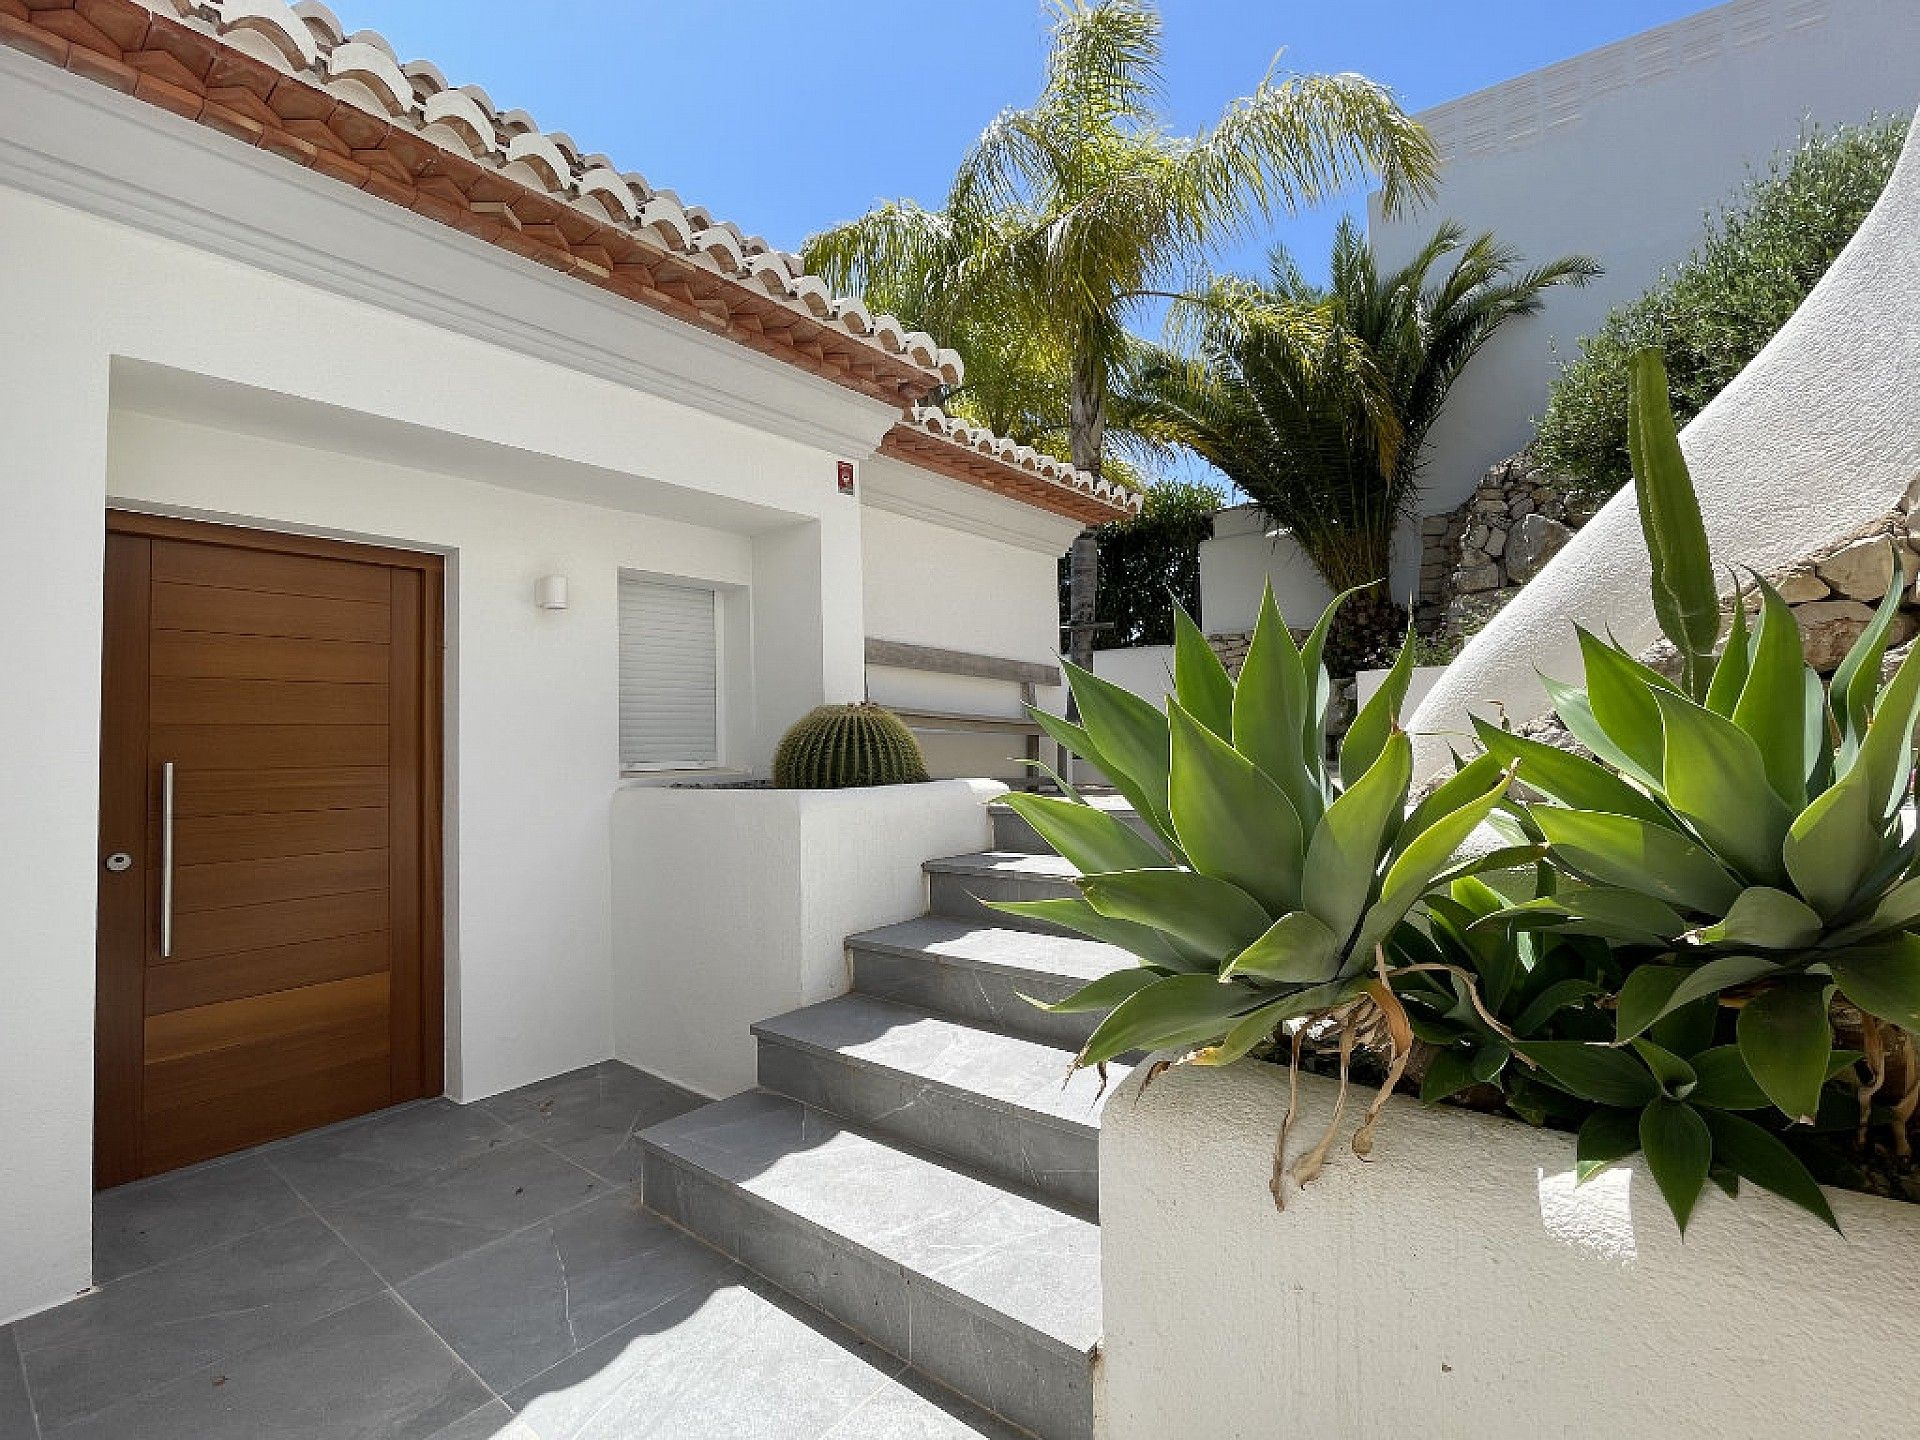 w_huis-tekoop-costa-blanca-benissa-spanje111-2-2-2-2-3.jpg